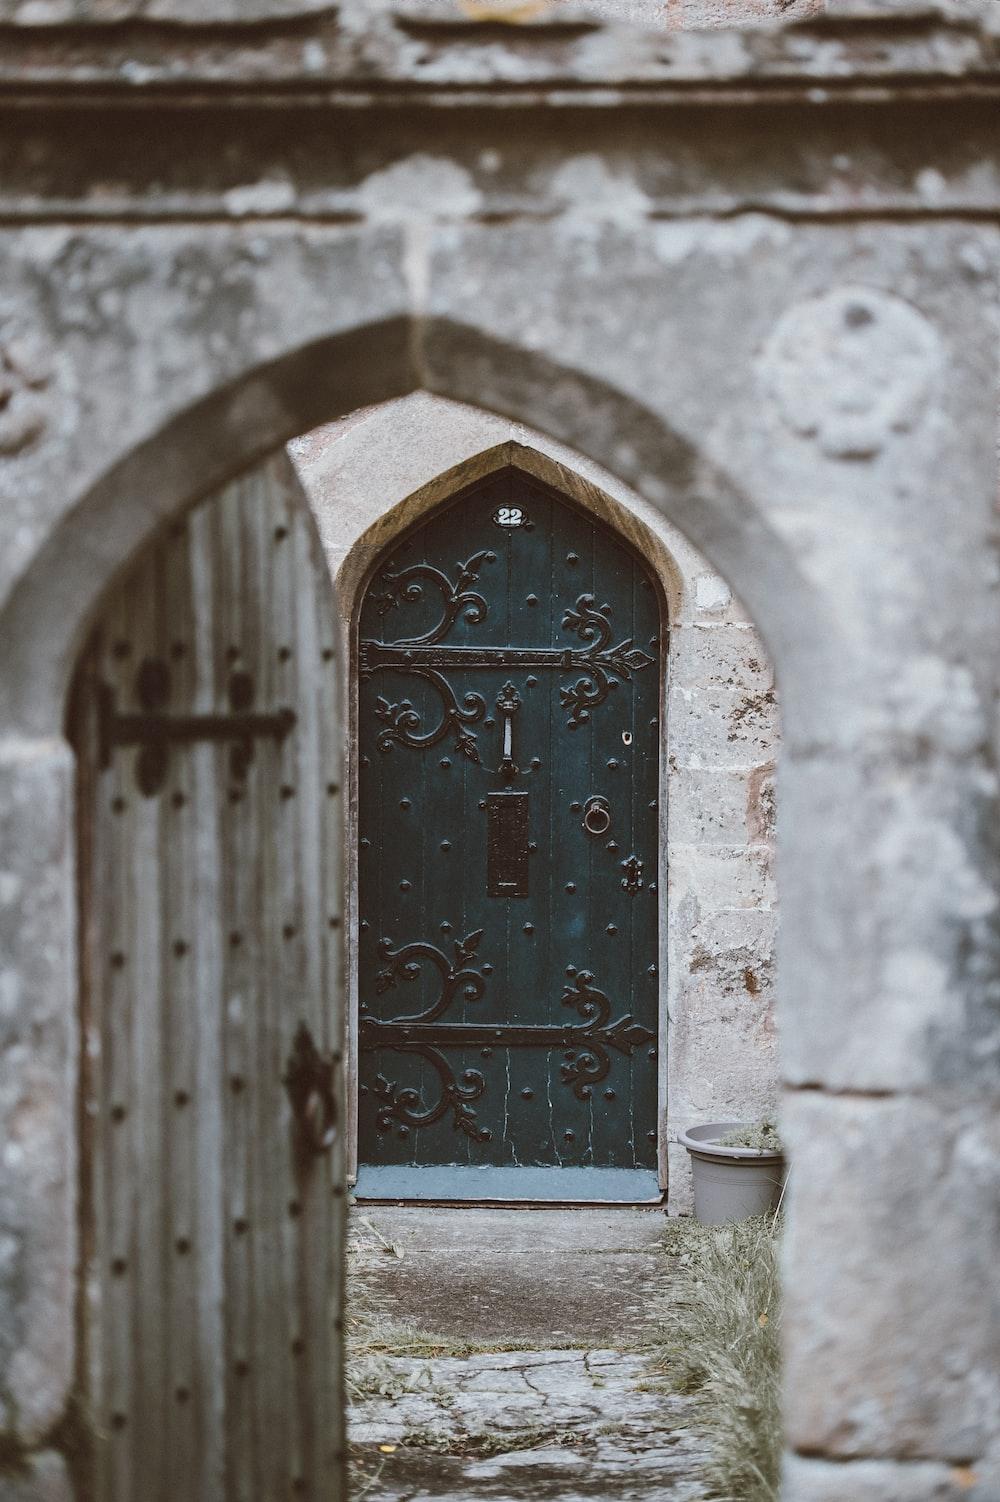 opened gray wooden door with closed green wooden door at the distance